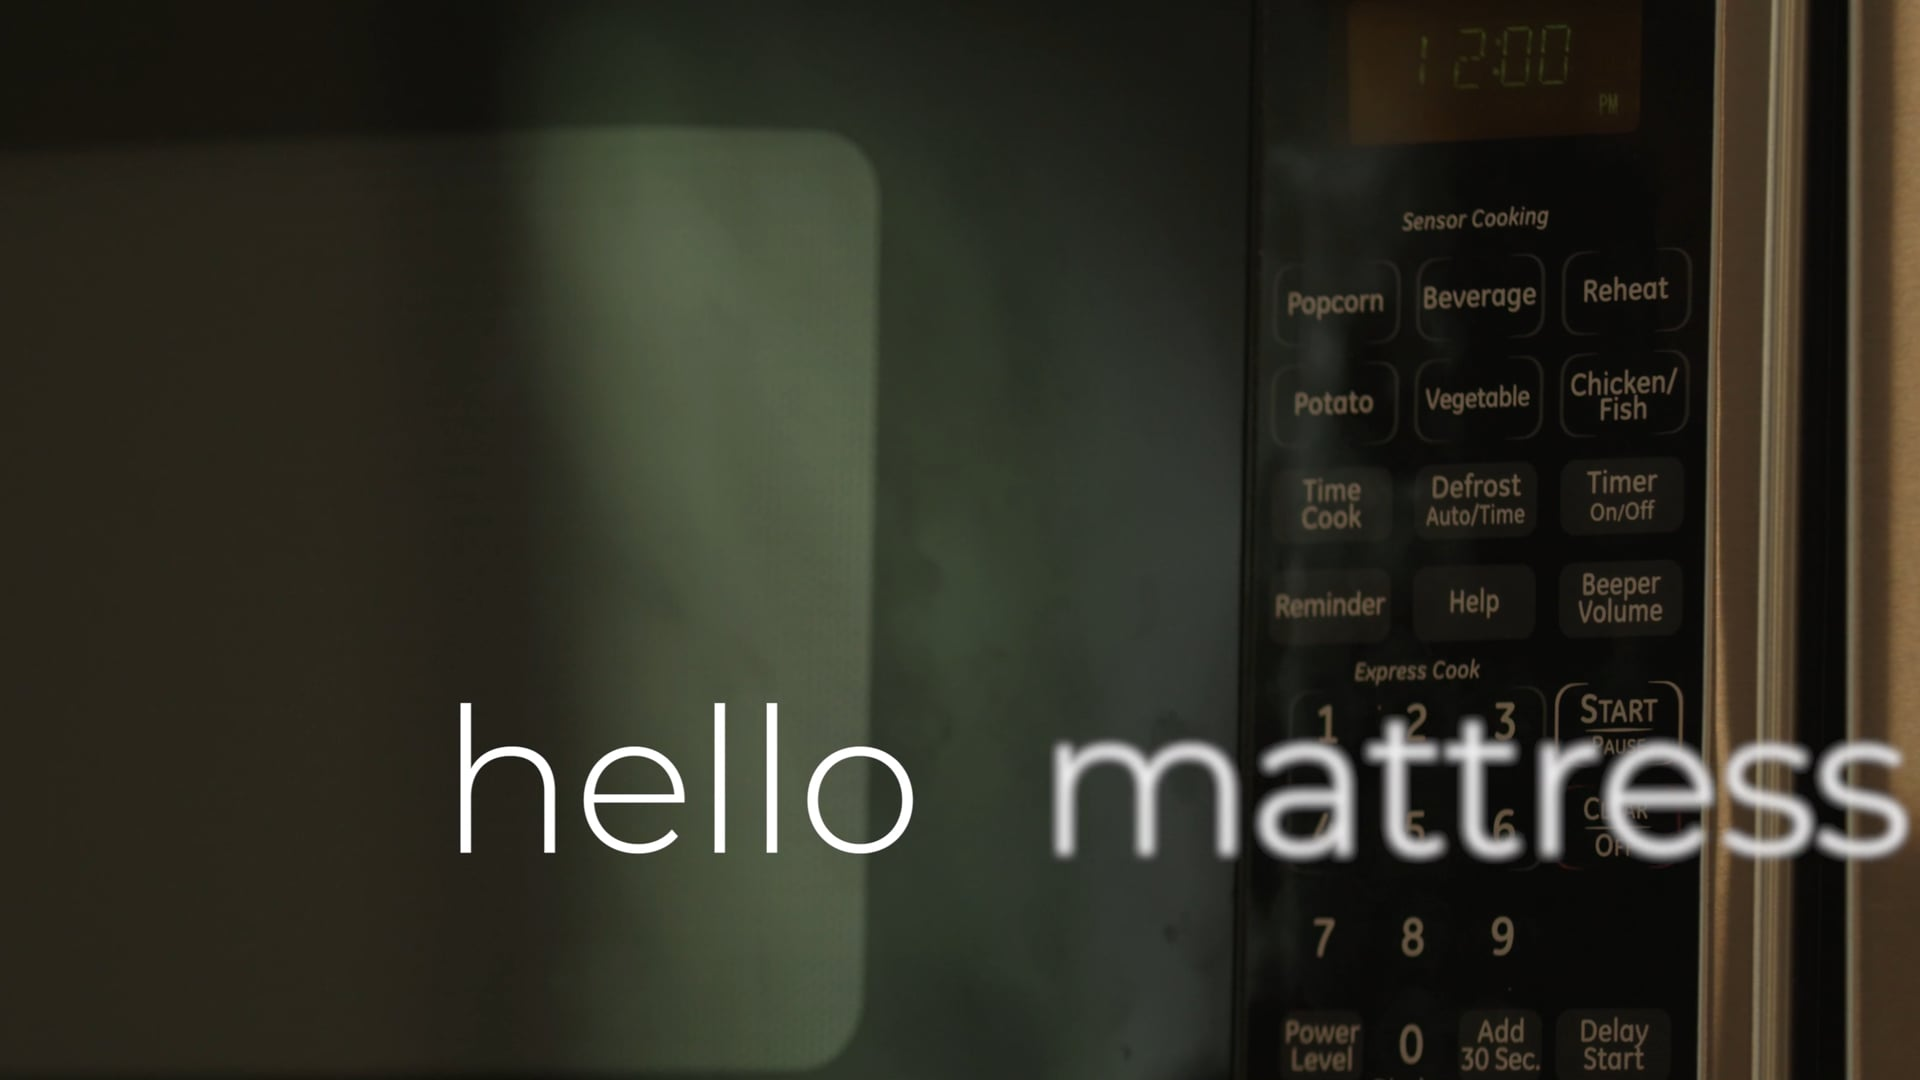 Hello Mattress